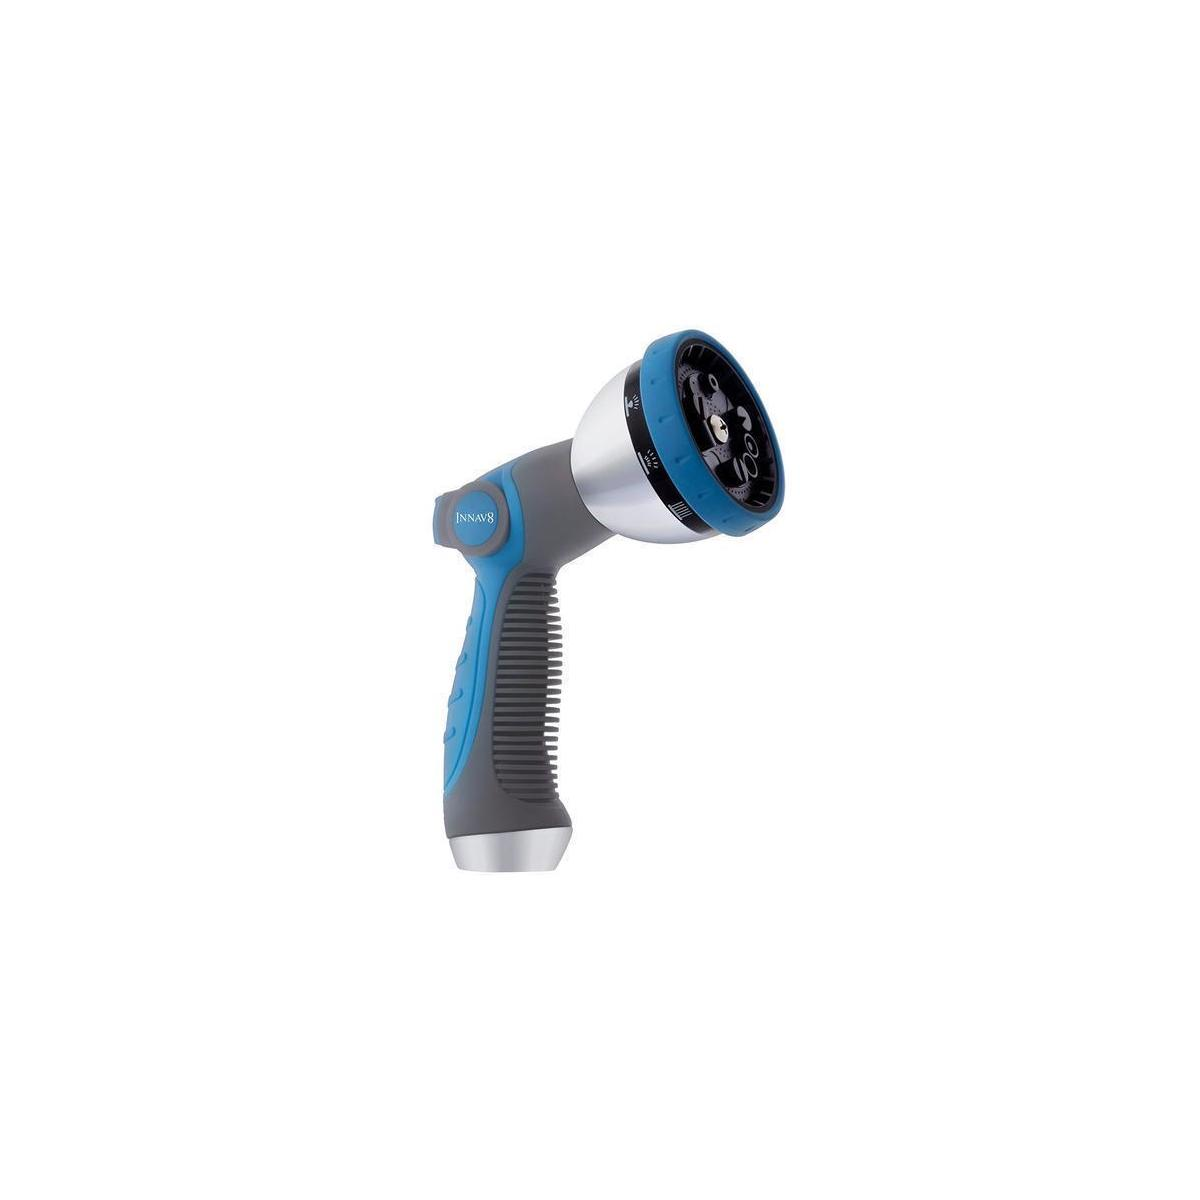 Garden Hose Nozzle - Easy Thumb Control